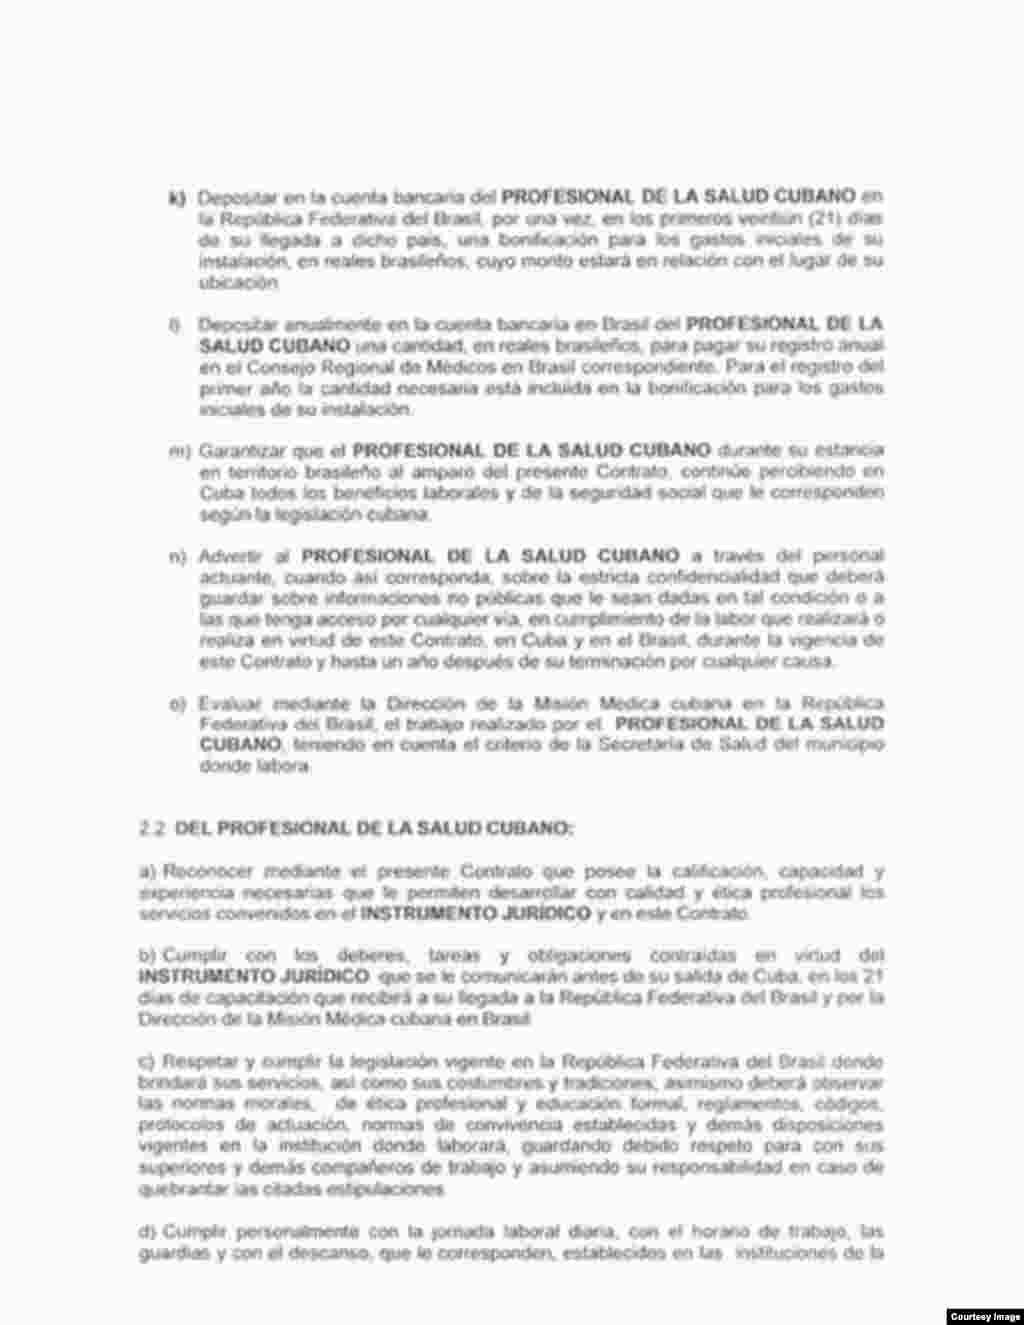 Copia de contrato de médica cubana en Brasil, tercera página.